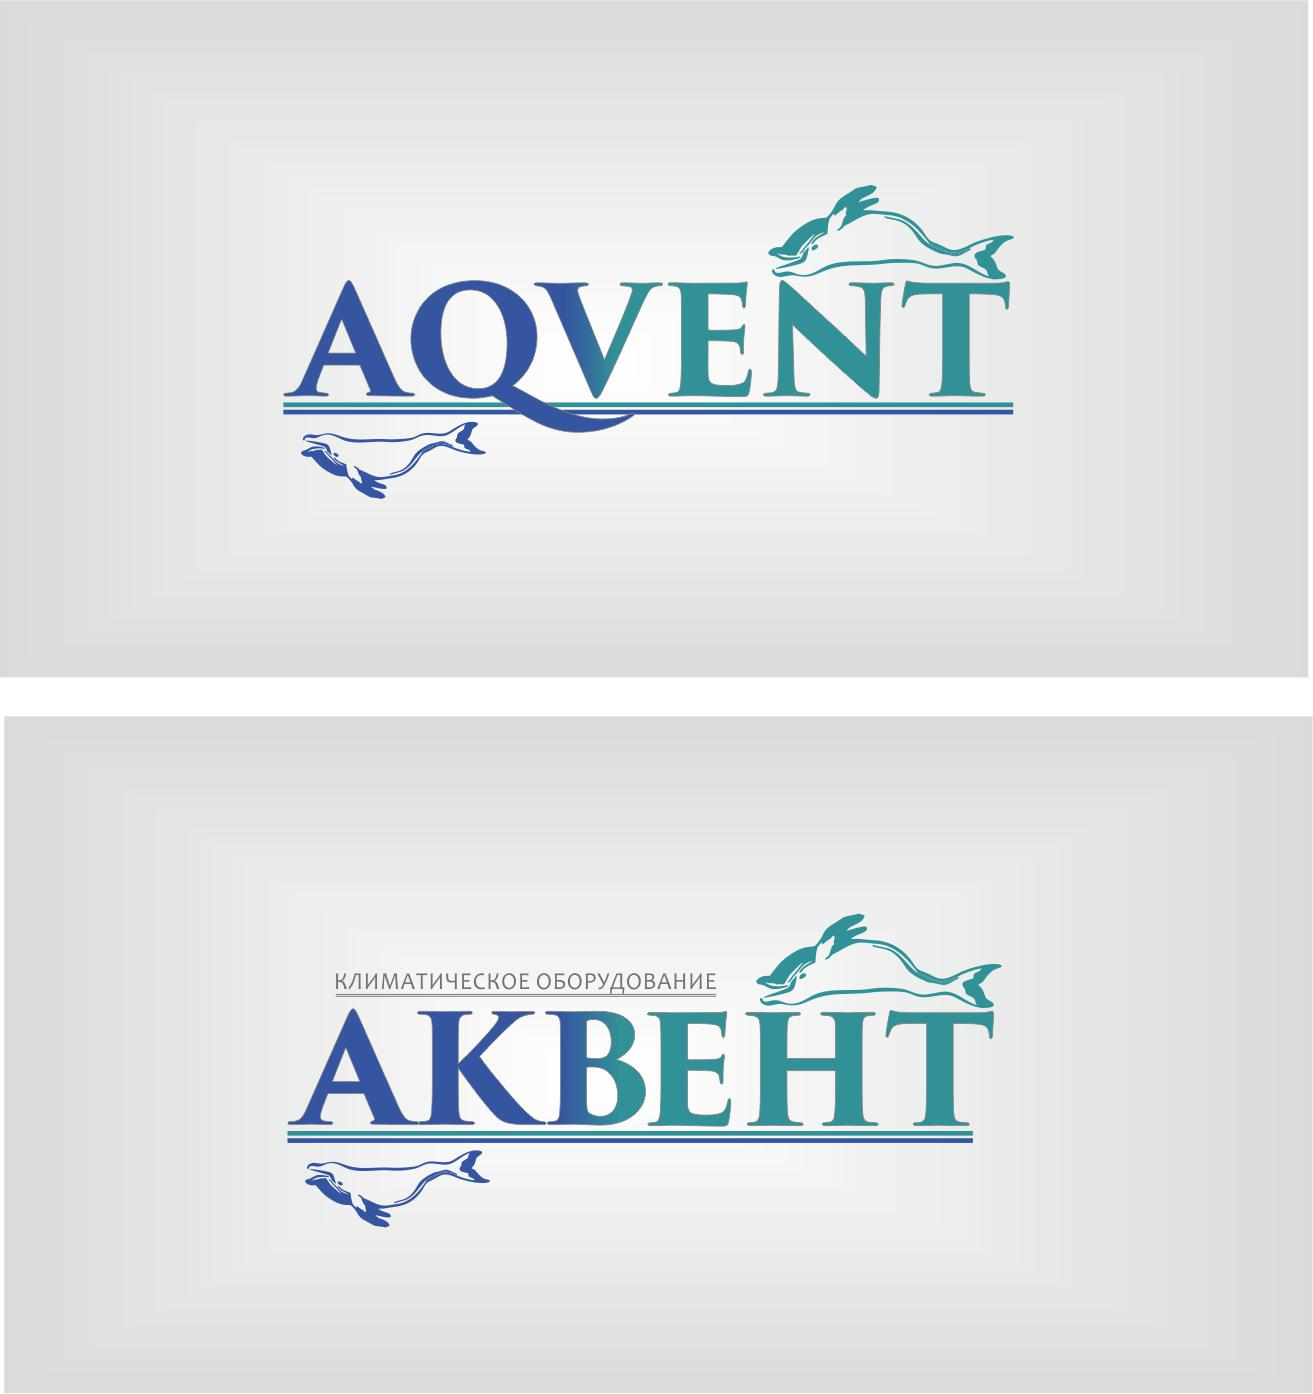 Логотип AQVENT фото f_7325281dbc27254a.jpg